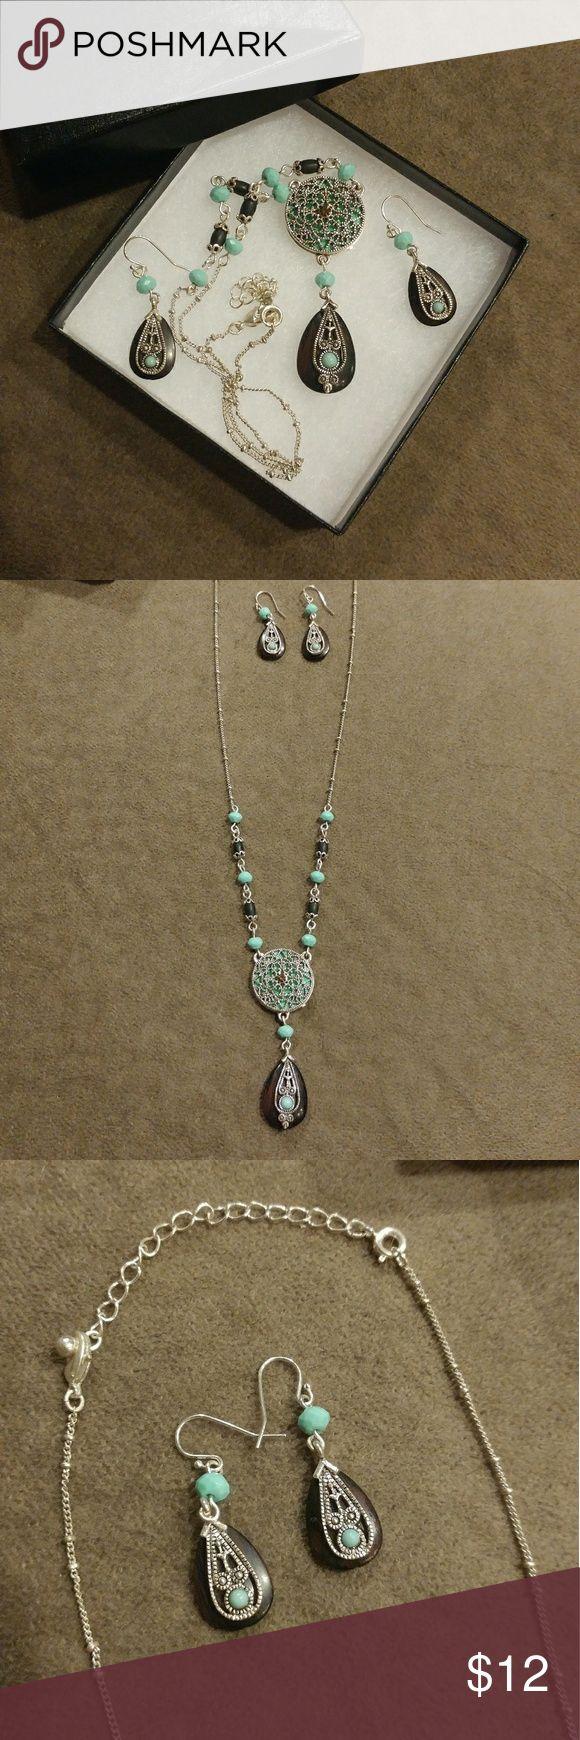 { Apricot Lane } Turquoise-N-Woods Set ...description soon! Jewelry